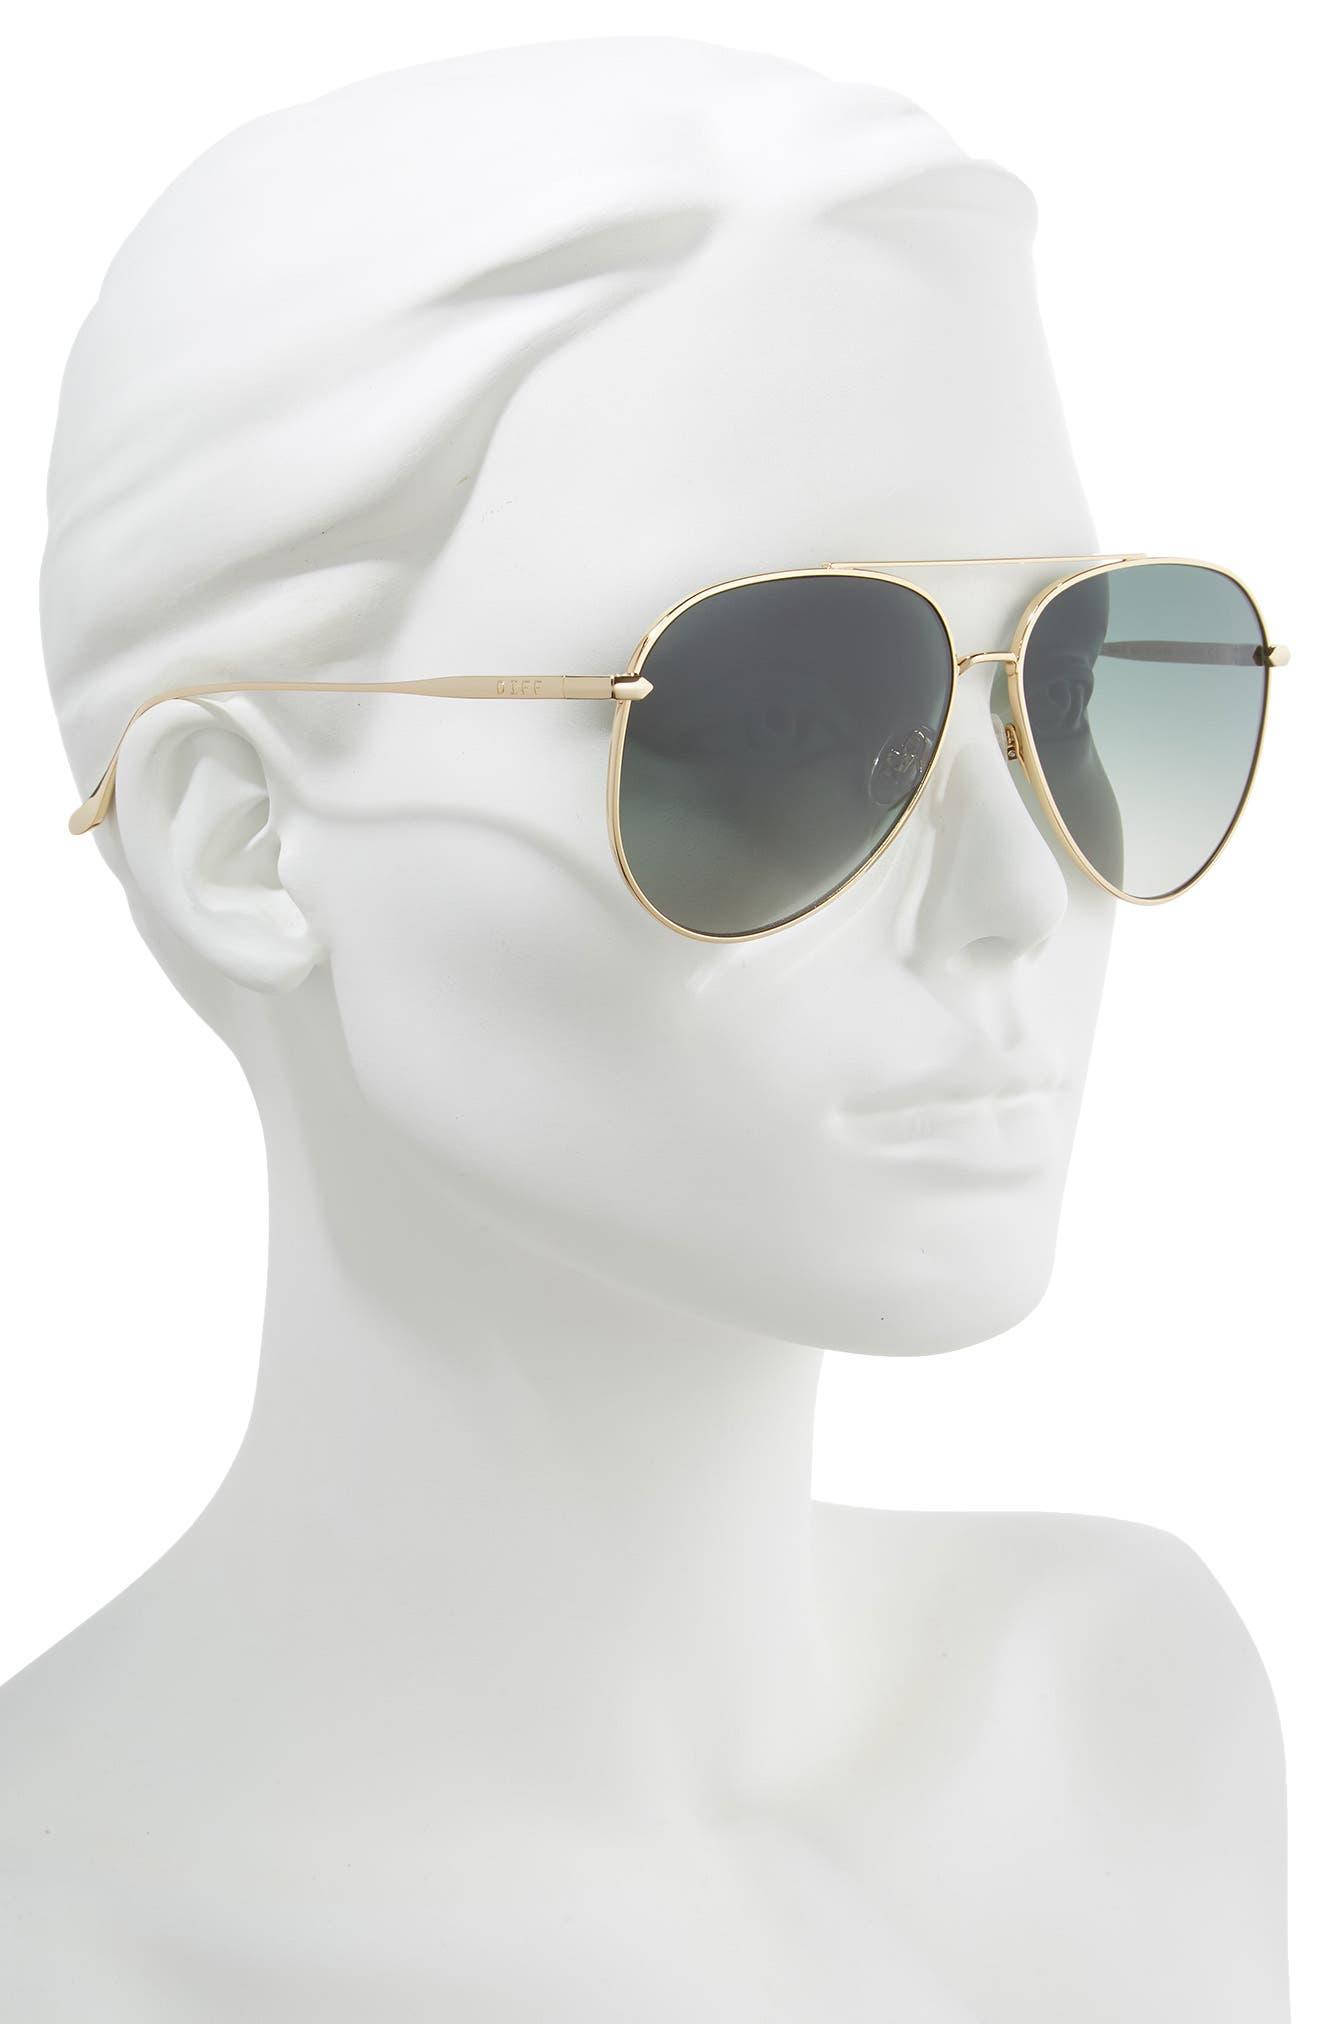 Nala 63mm Oversize Polarized Aviator Sunglasses,                             Alternate thumbnail 2, color,                             GOLD/ G15